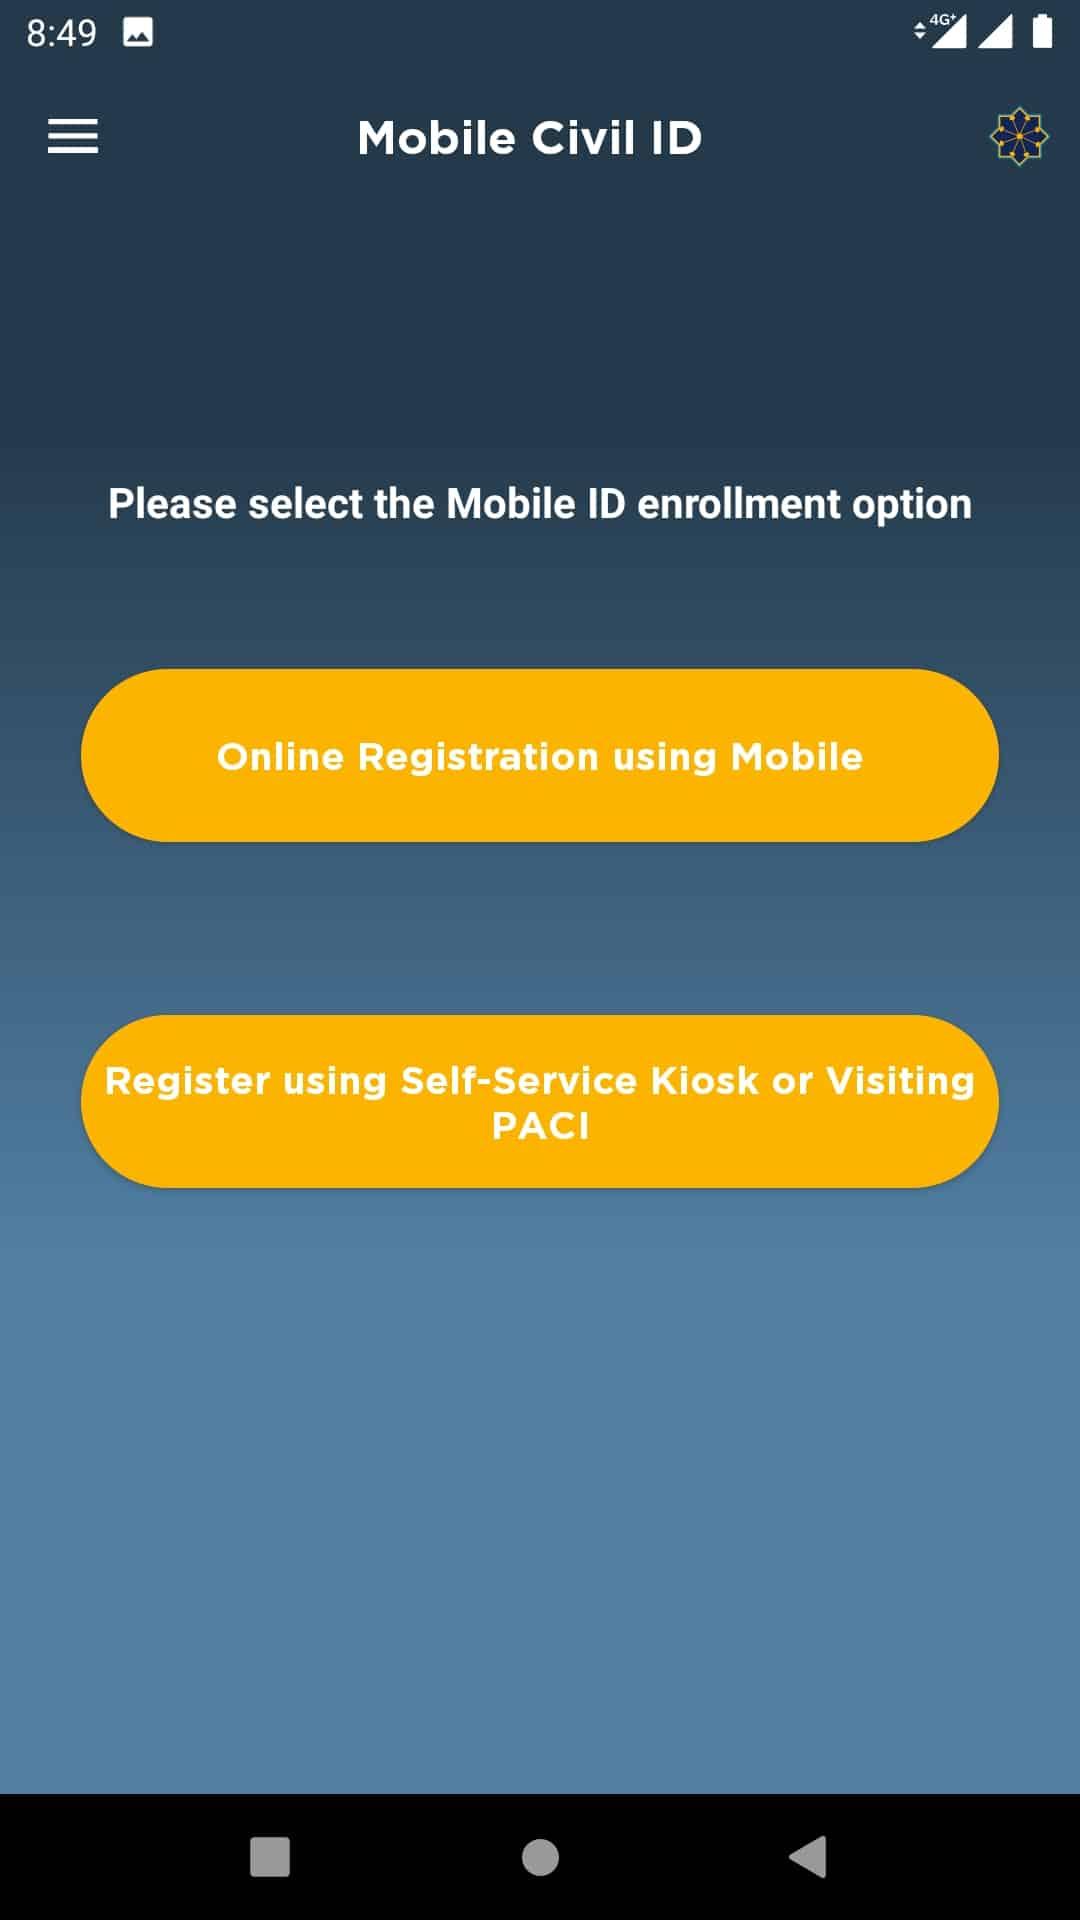 Activate Digital Civil ID, Kuwait Civil ID on Mobile or Tab, iiQ8, PACI 3